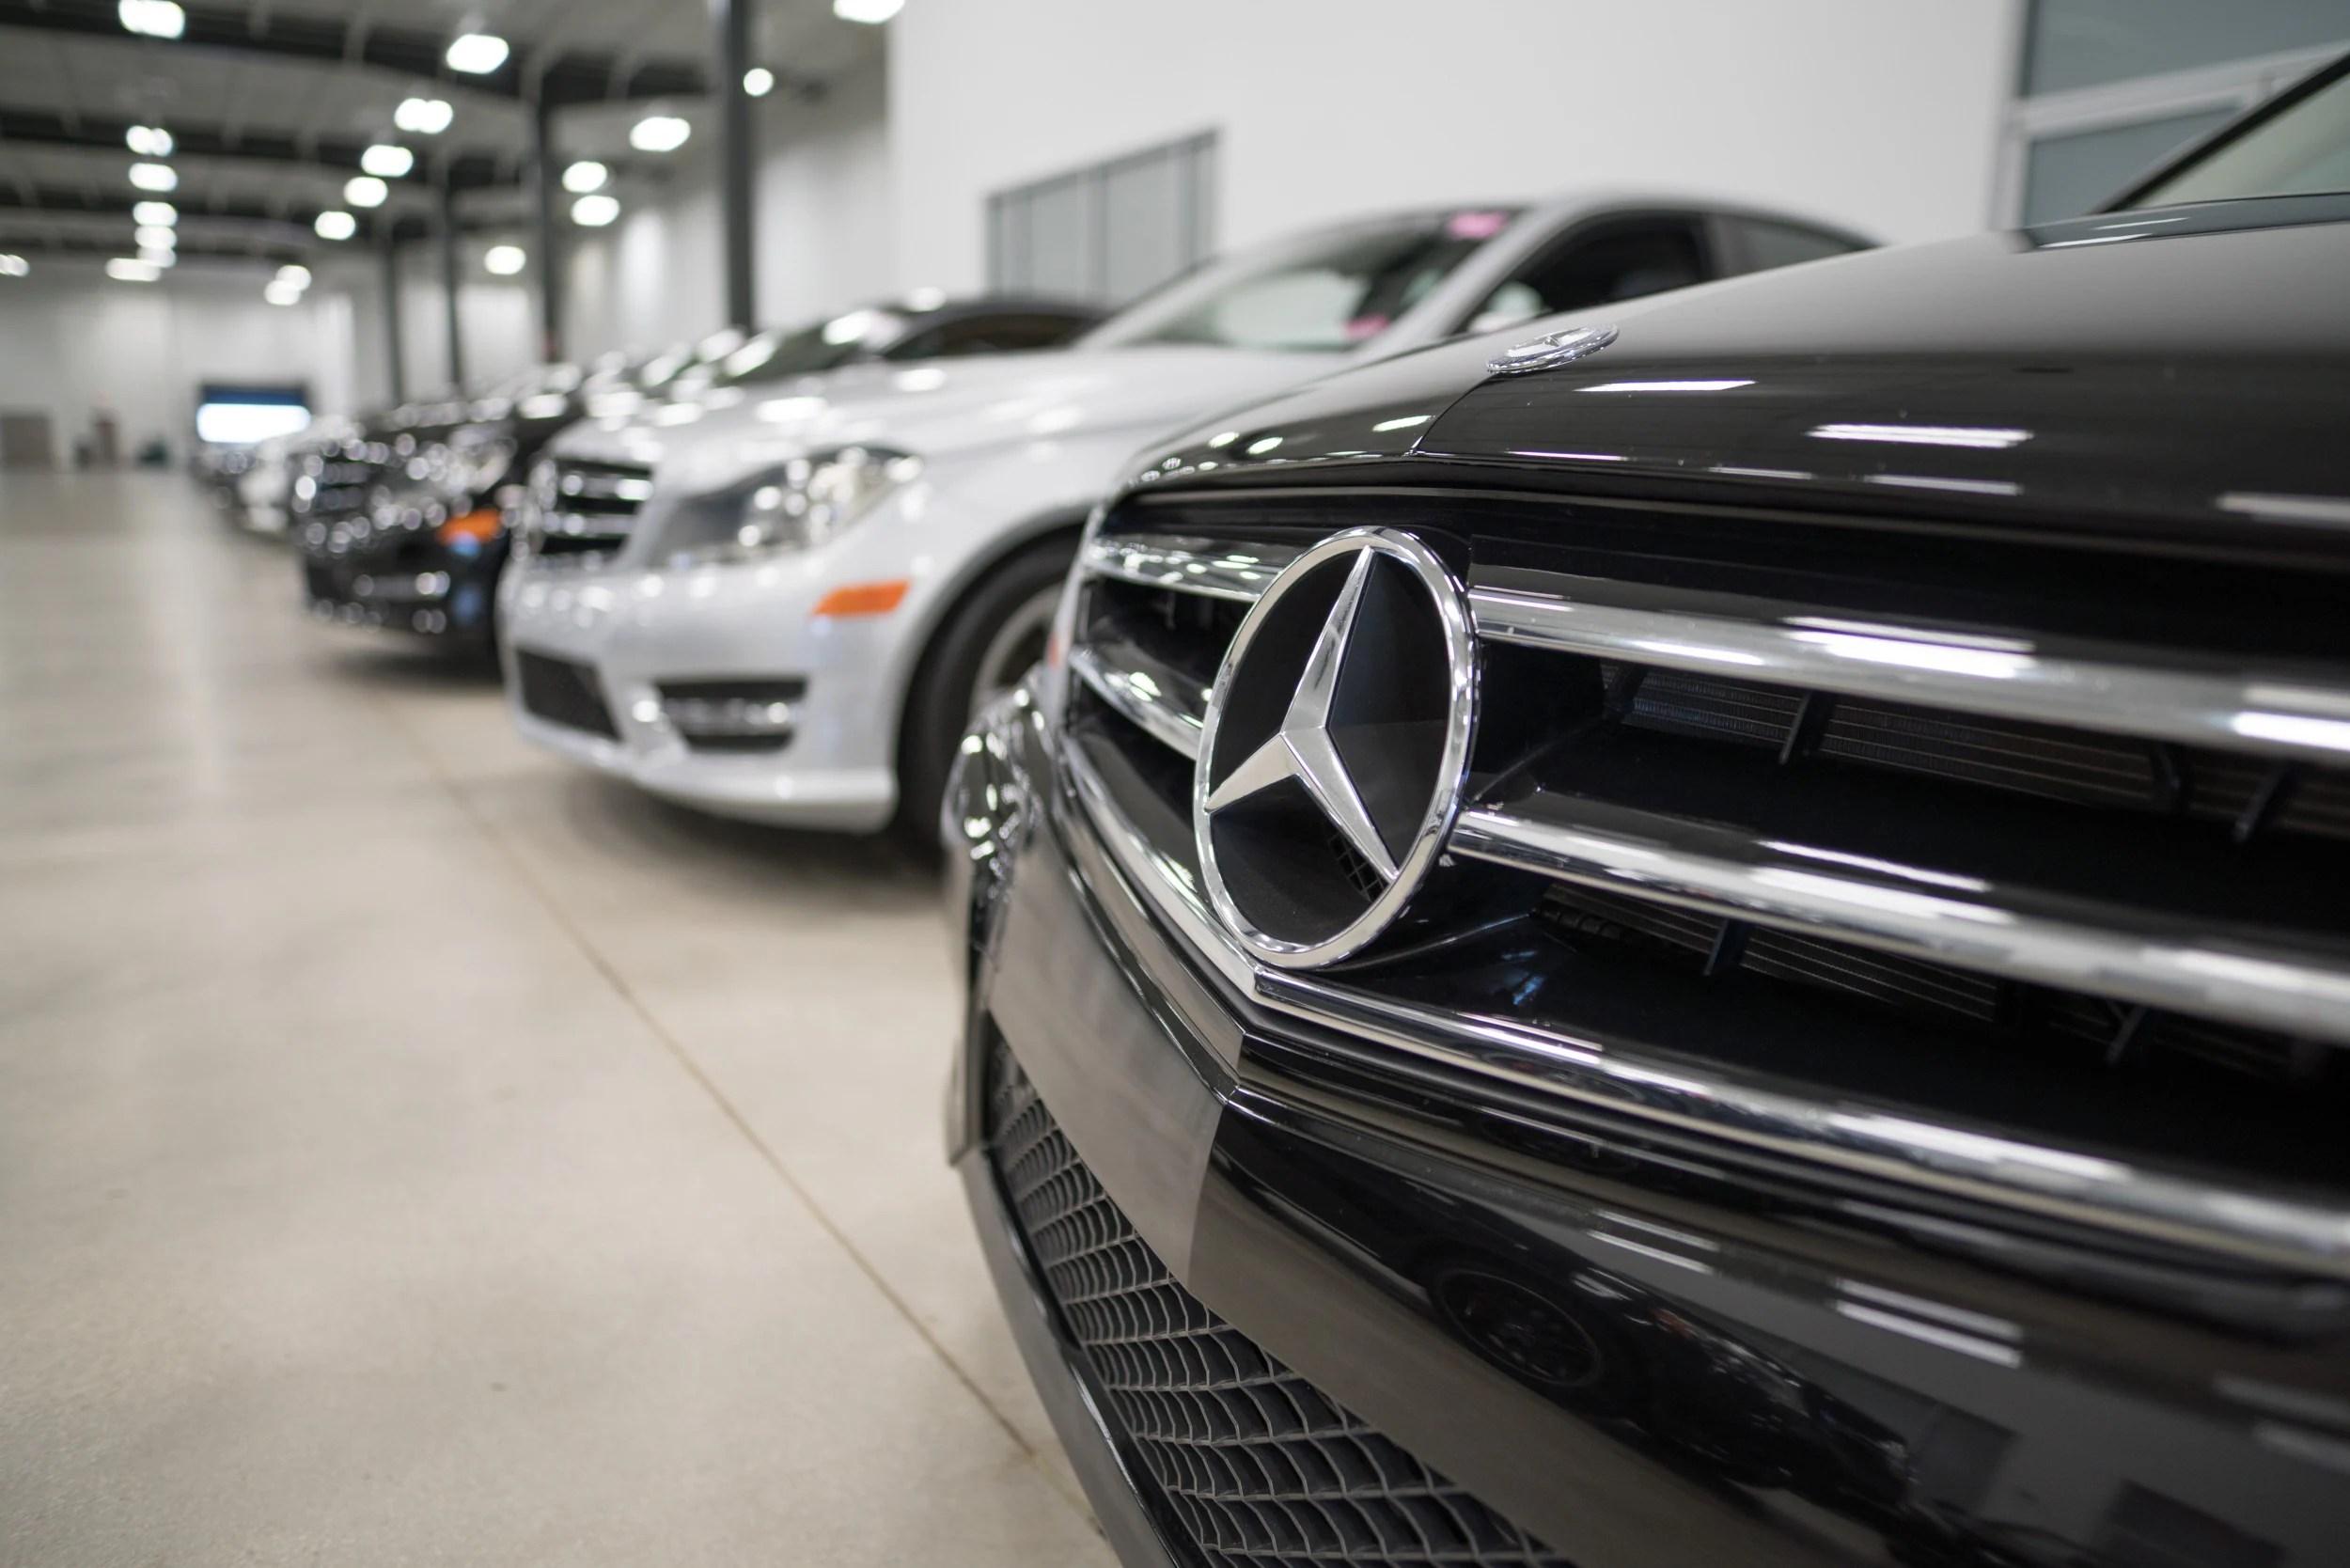 Mercedes Benz Dealership Near Me Delray Beach FL